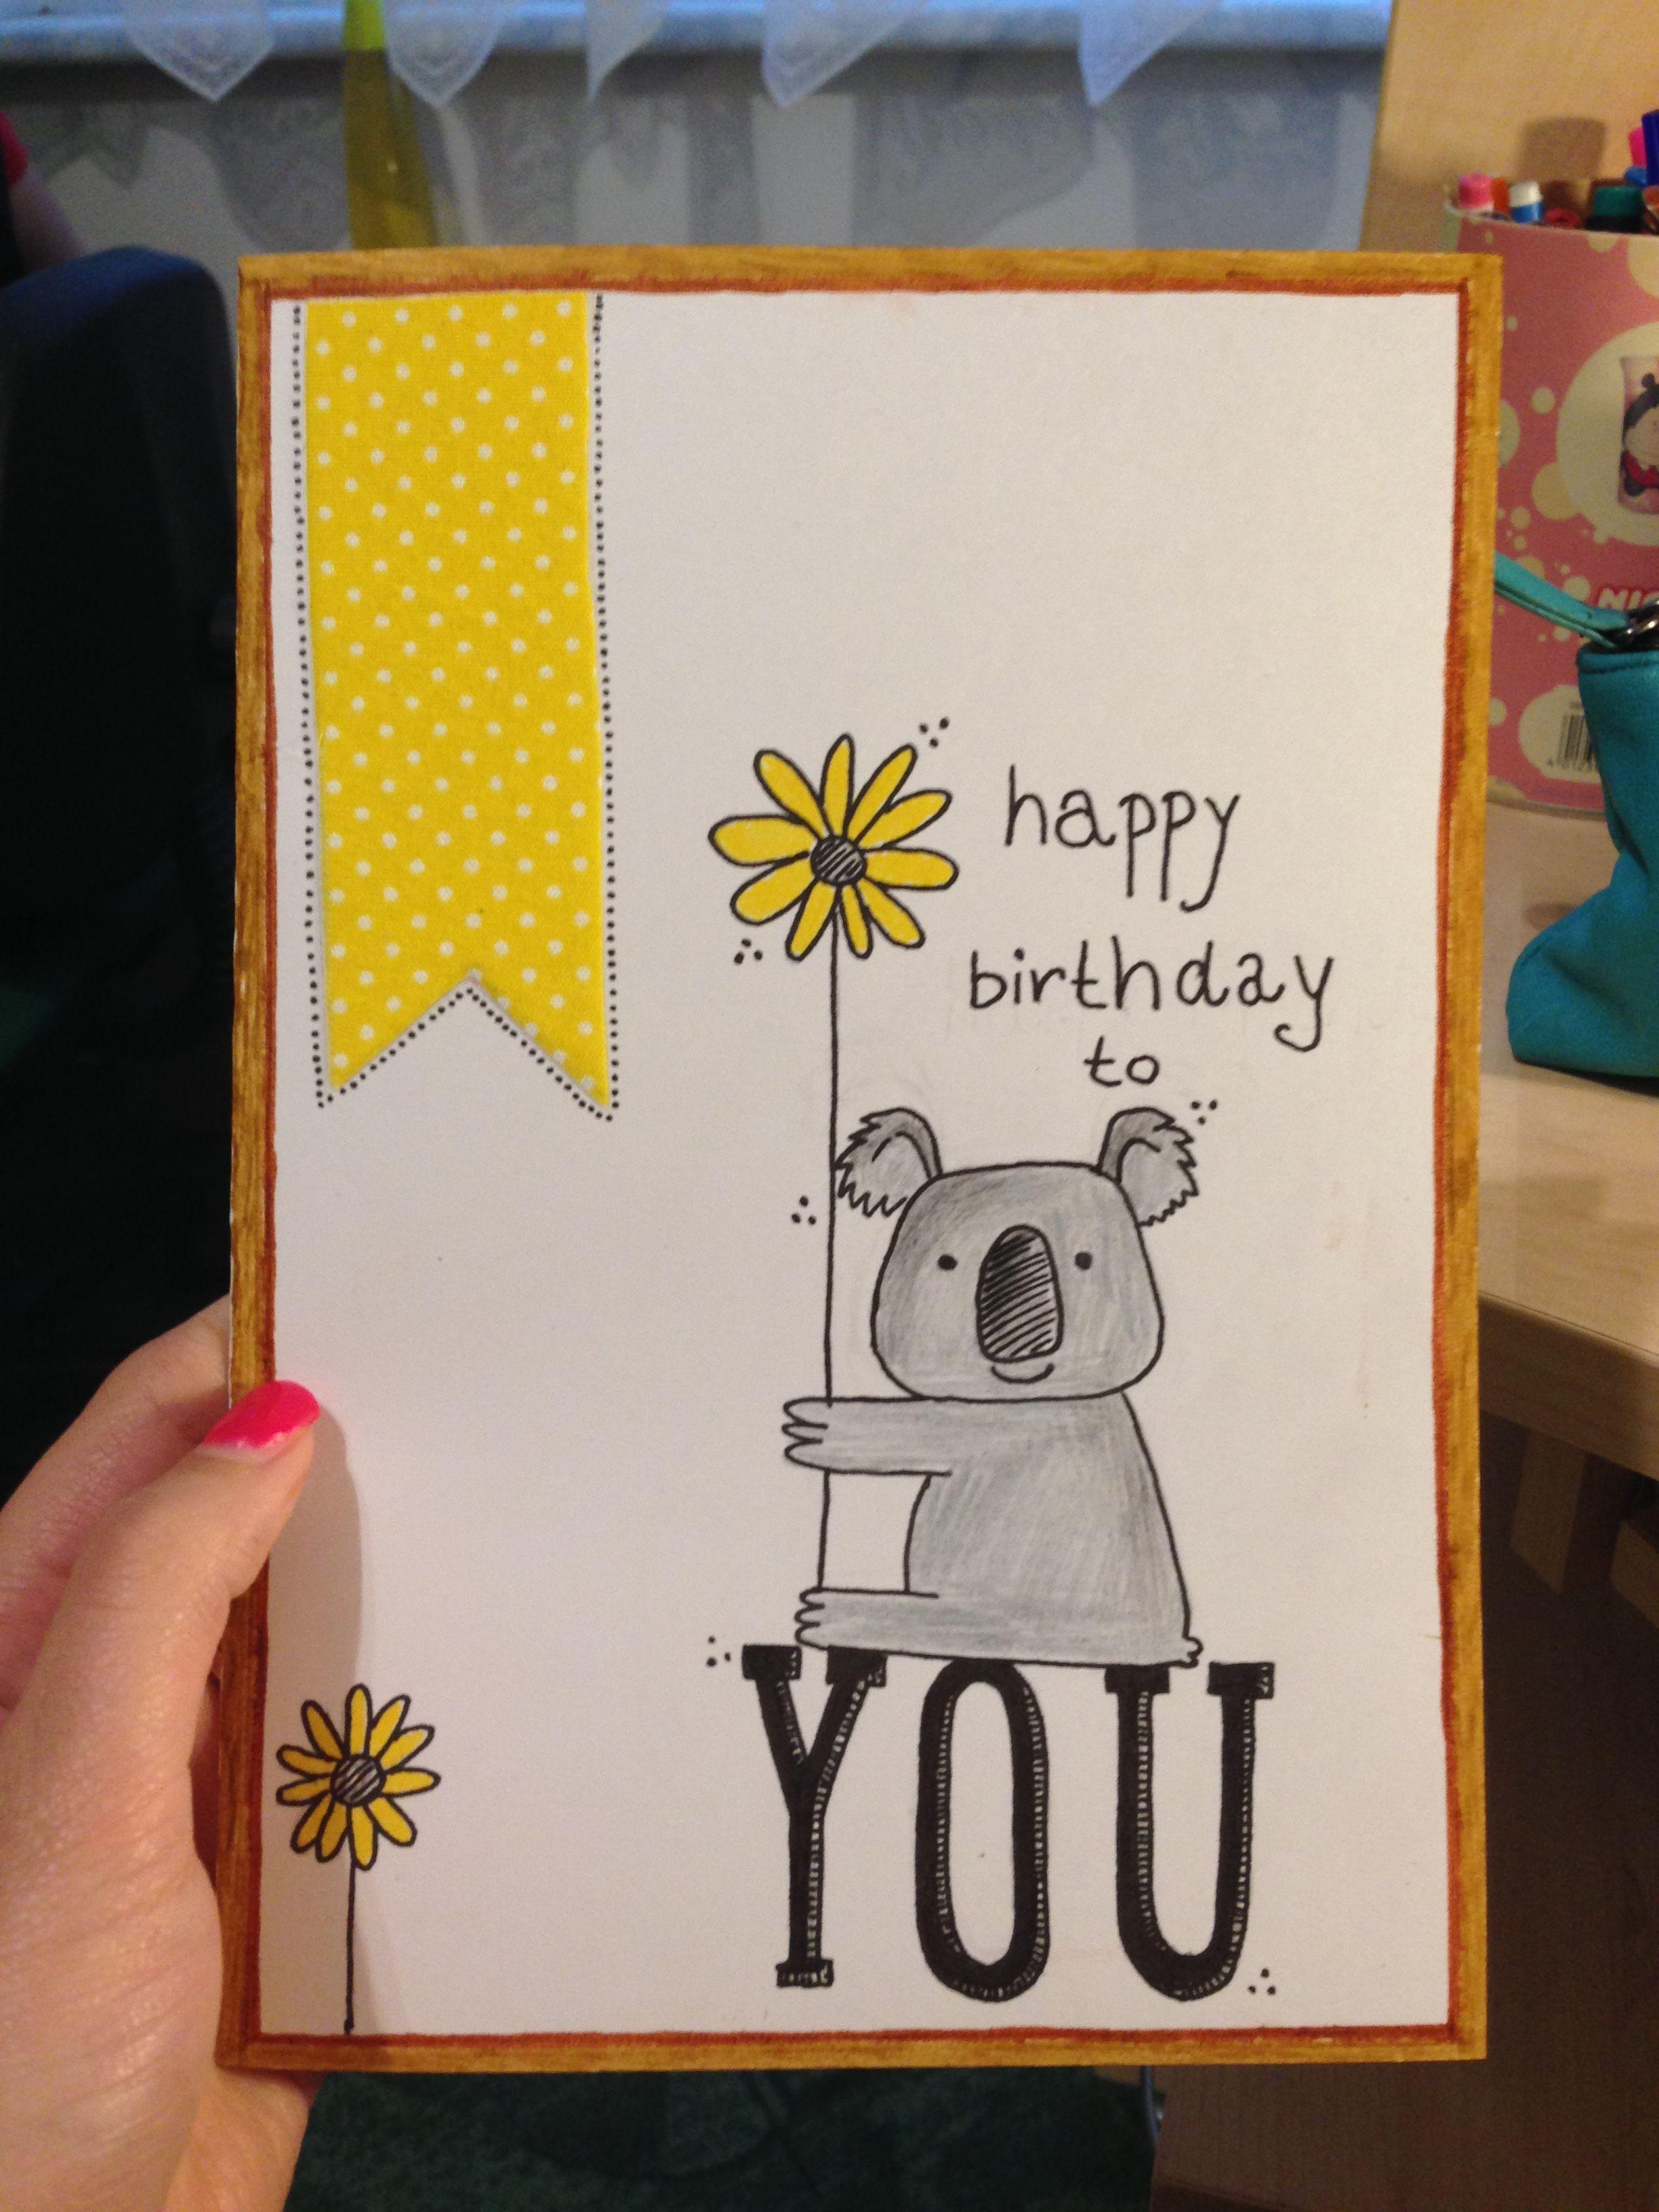 Diy Birthday Card Koala Happy Bird Day Birthday Cards Birthday Cards Diy